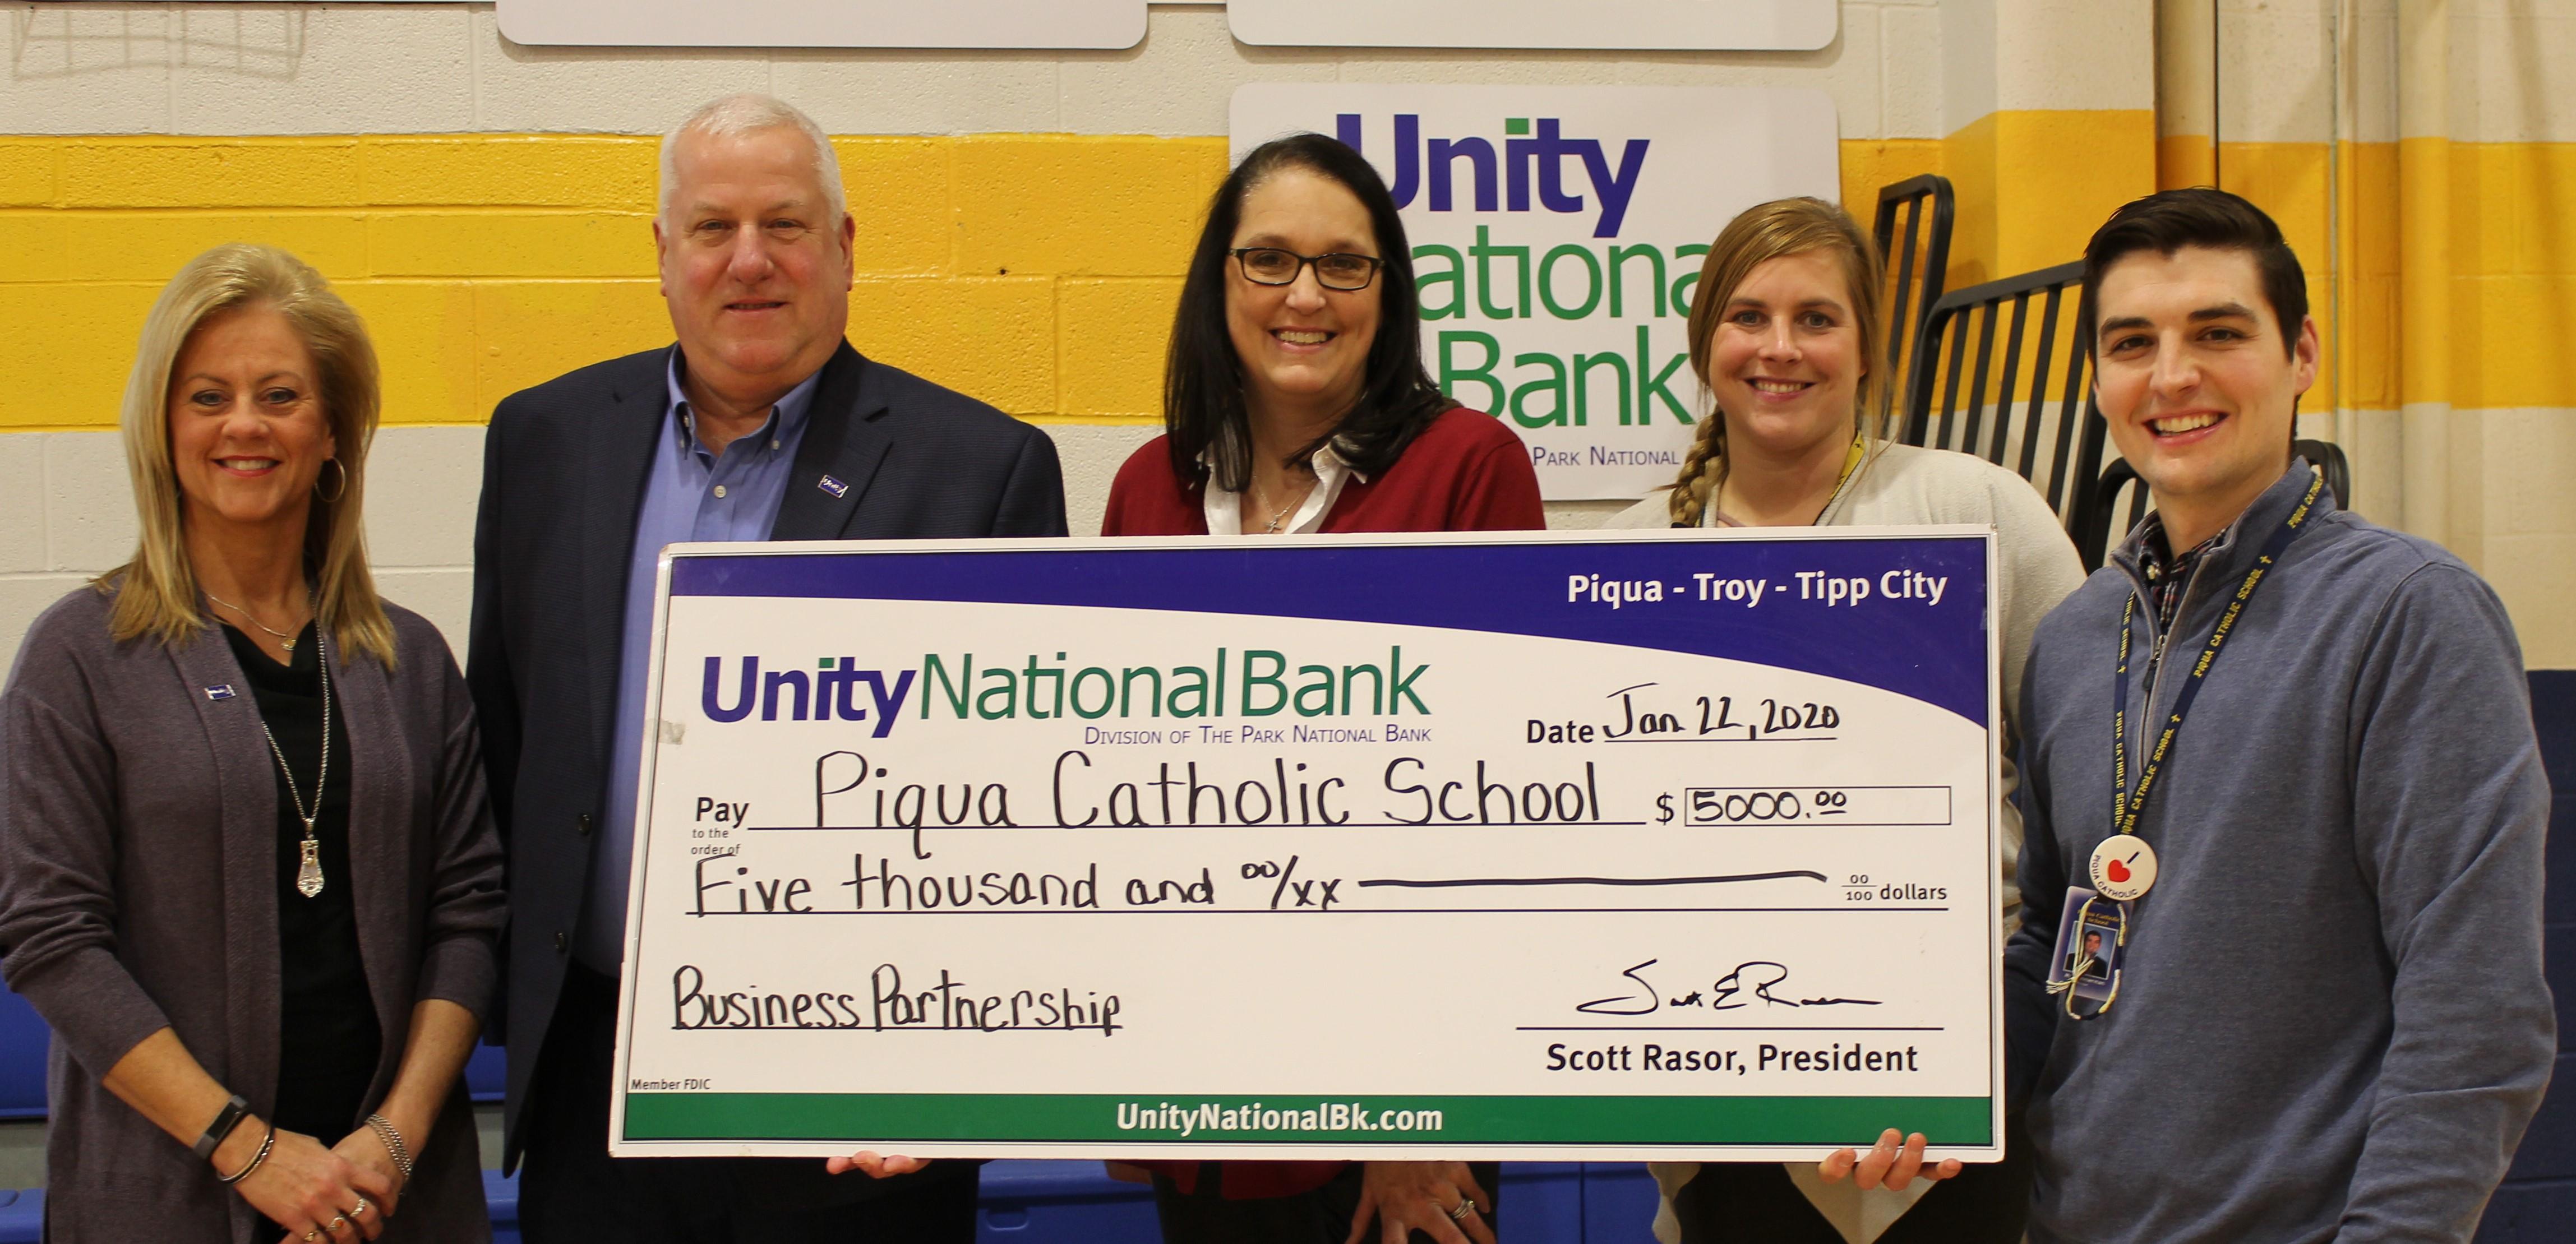 Piqua Catholic School Partnership